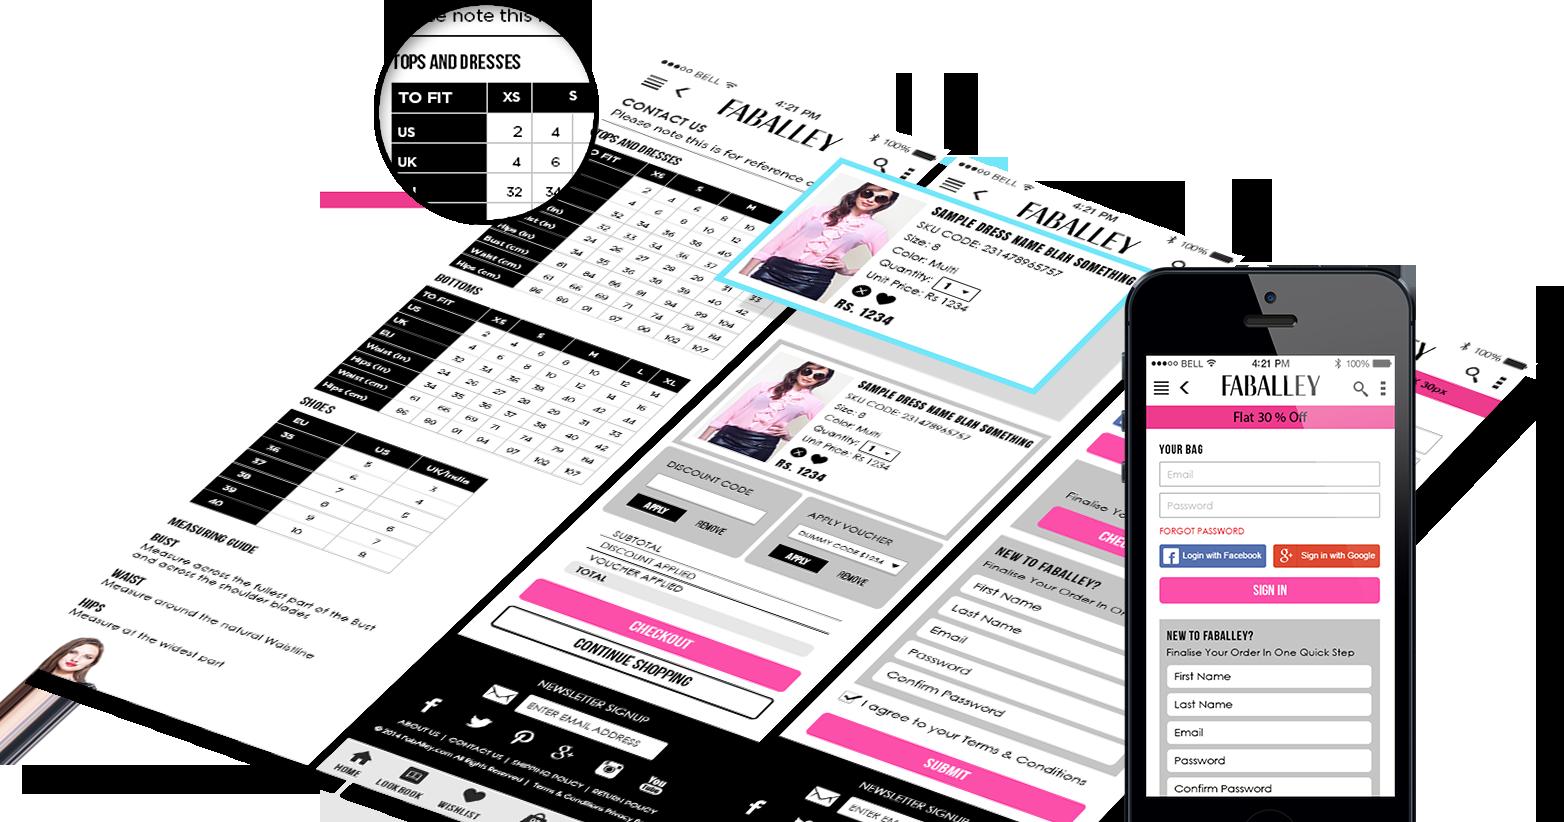 FabAlley mobile app development company